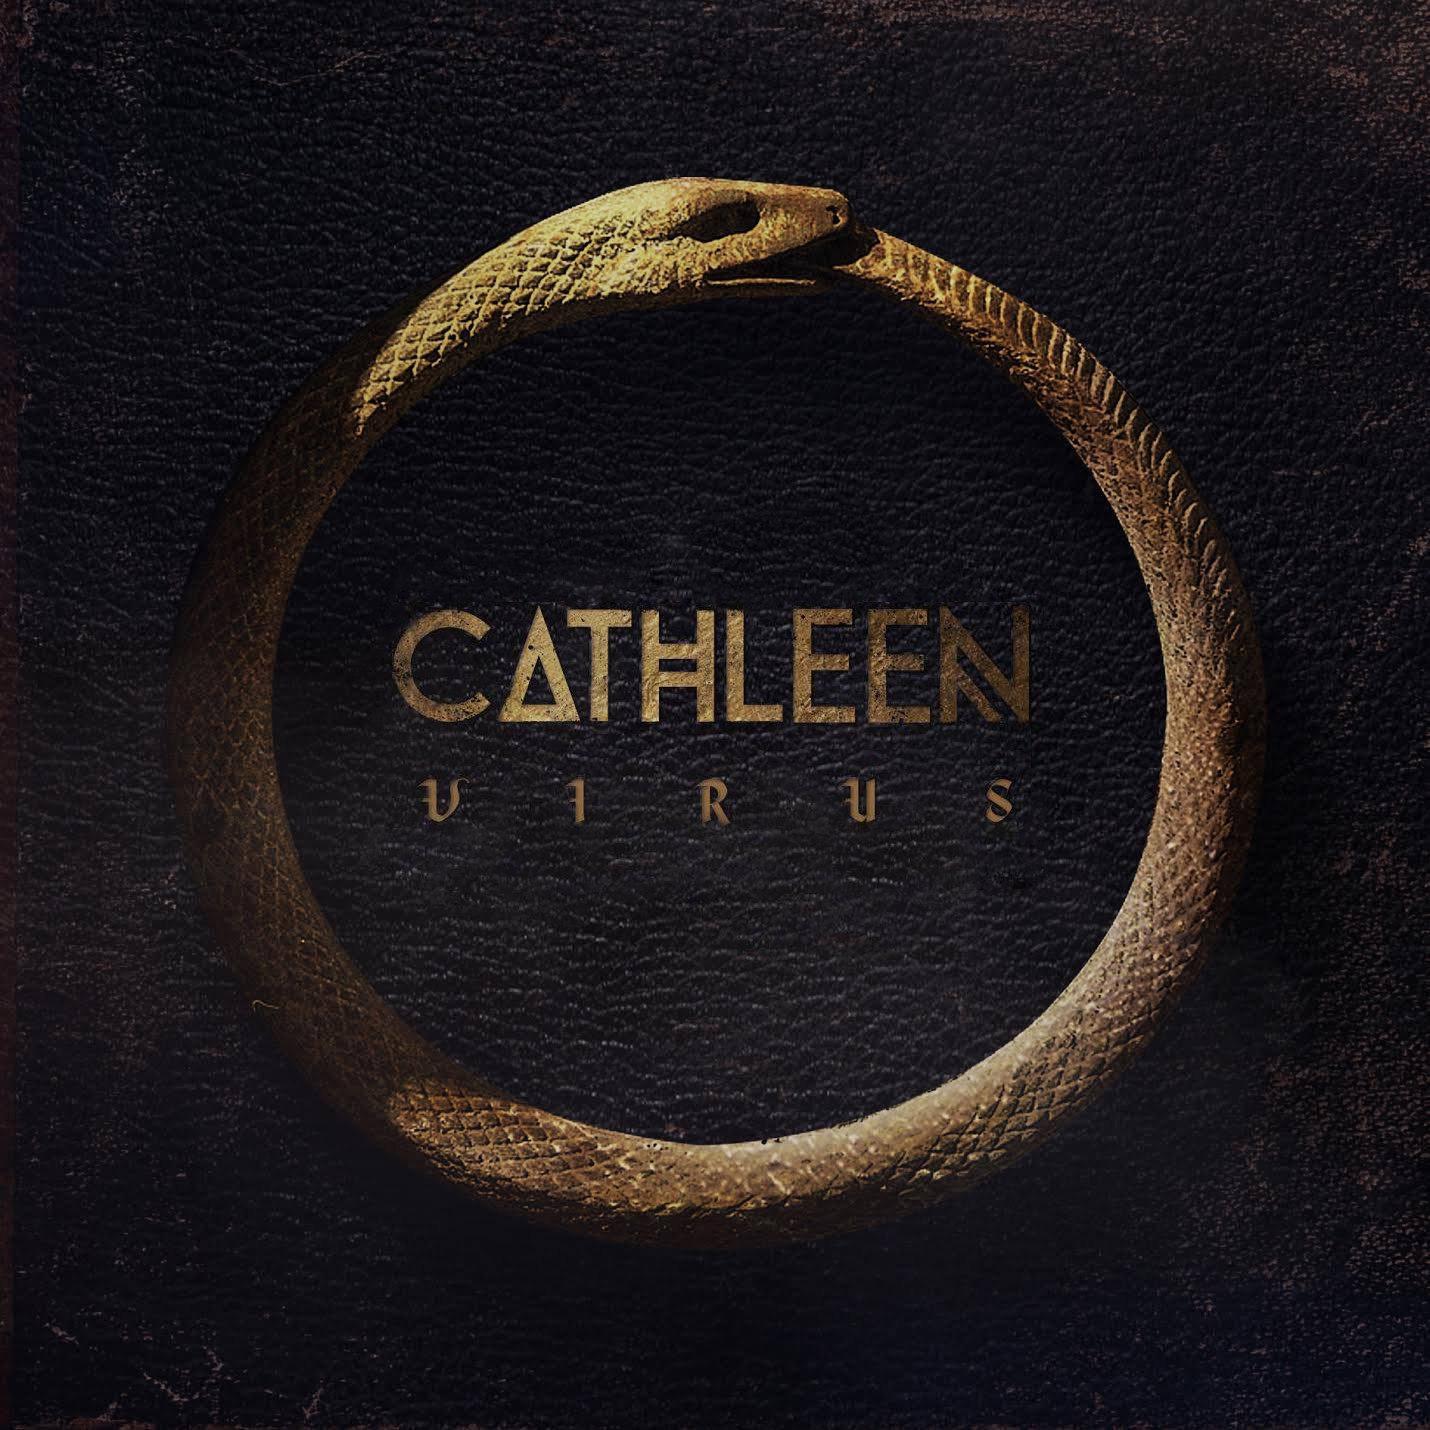 Cathleen - Unbowed [single] (2016)